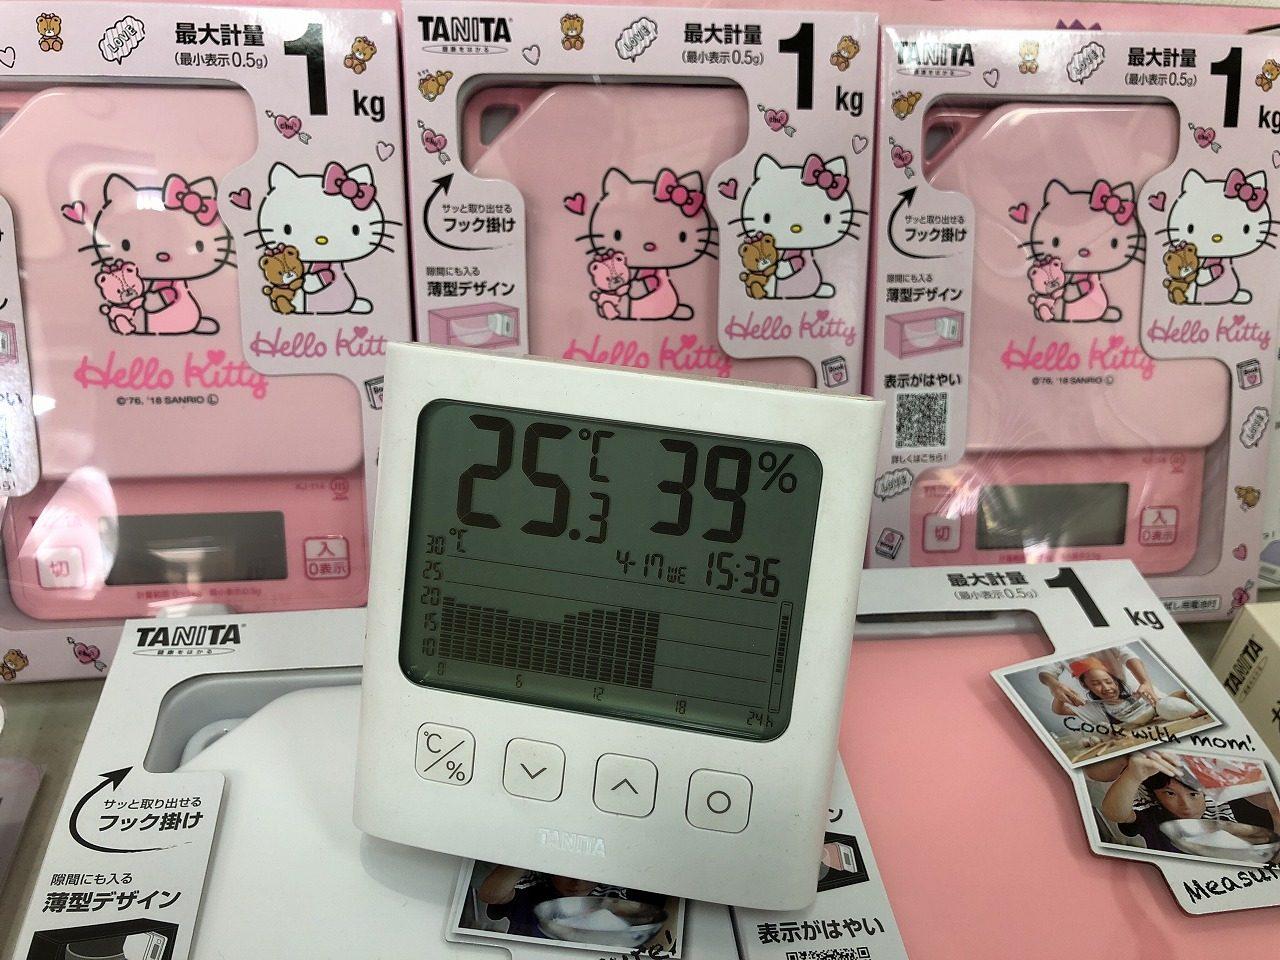 TT-581 グラフ付き温湿度計